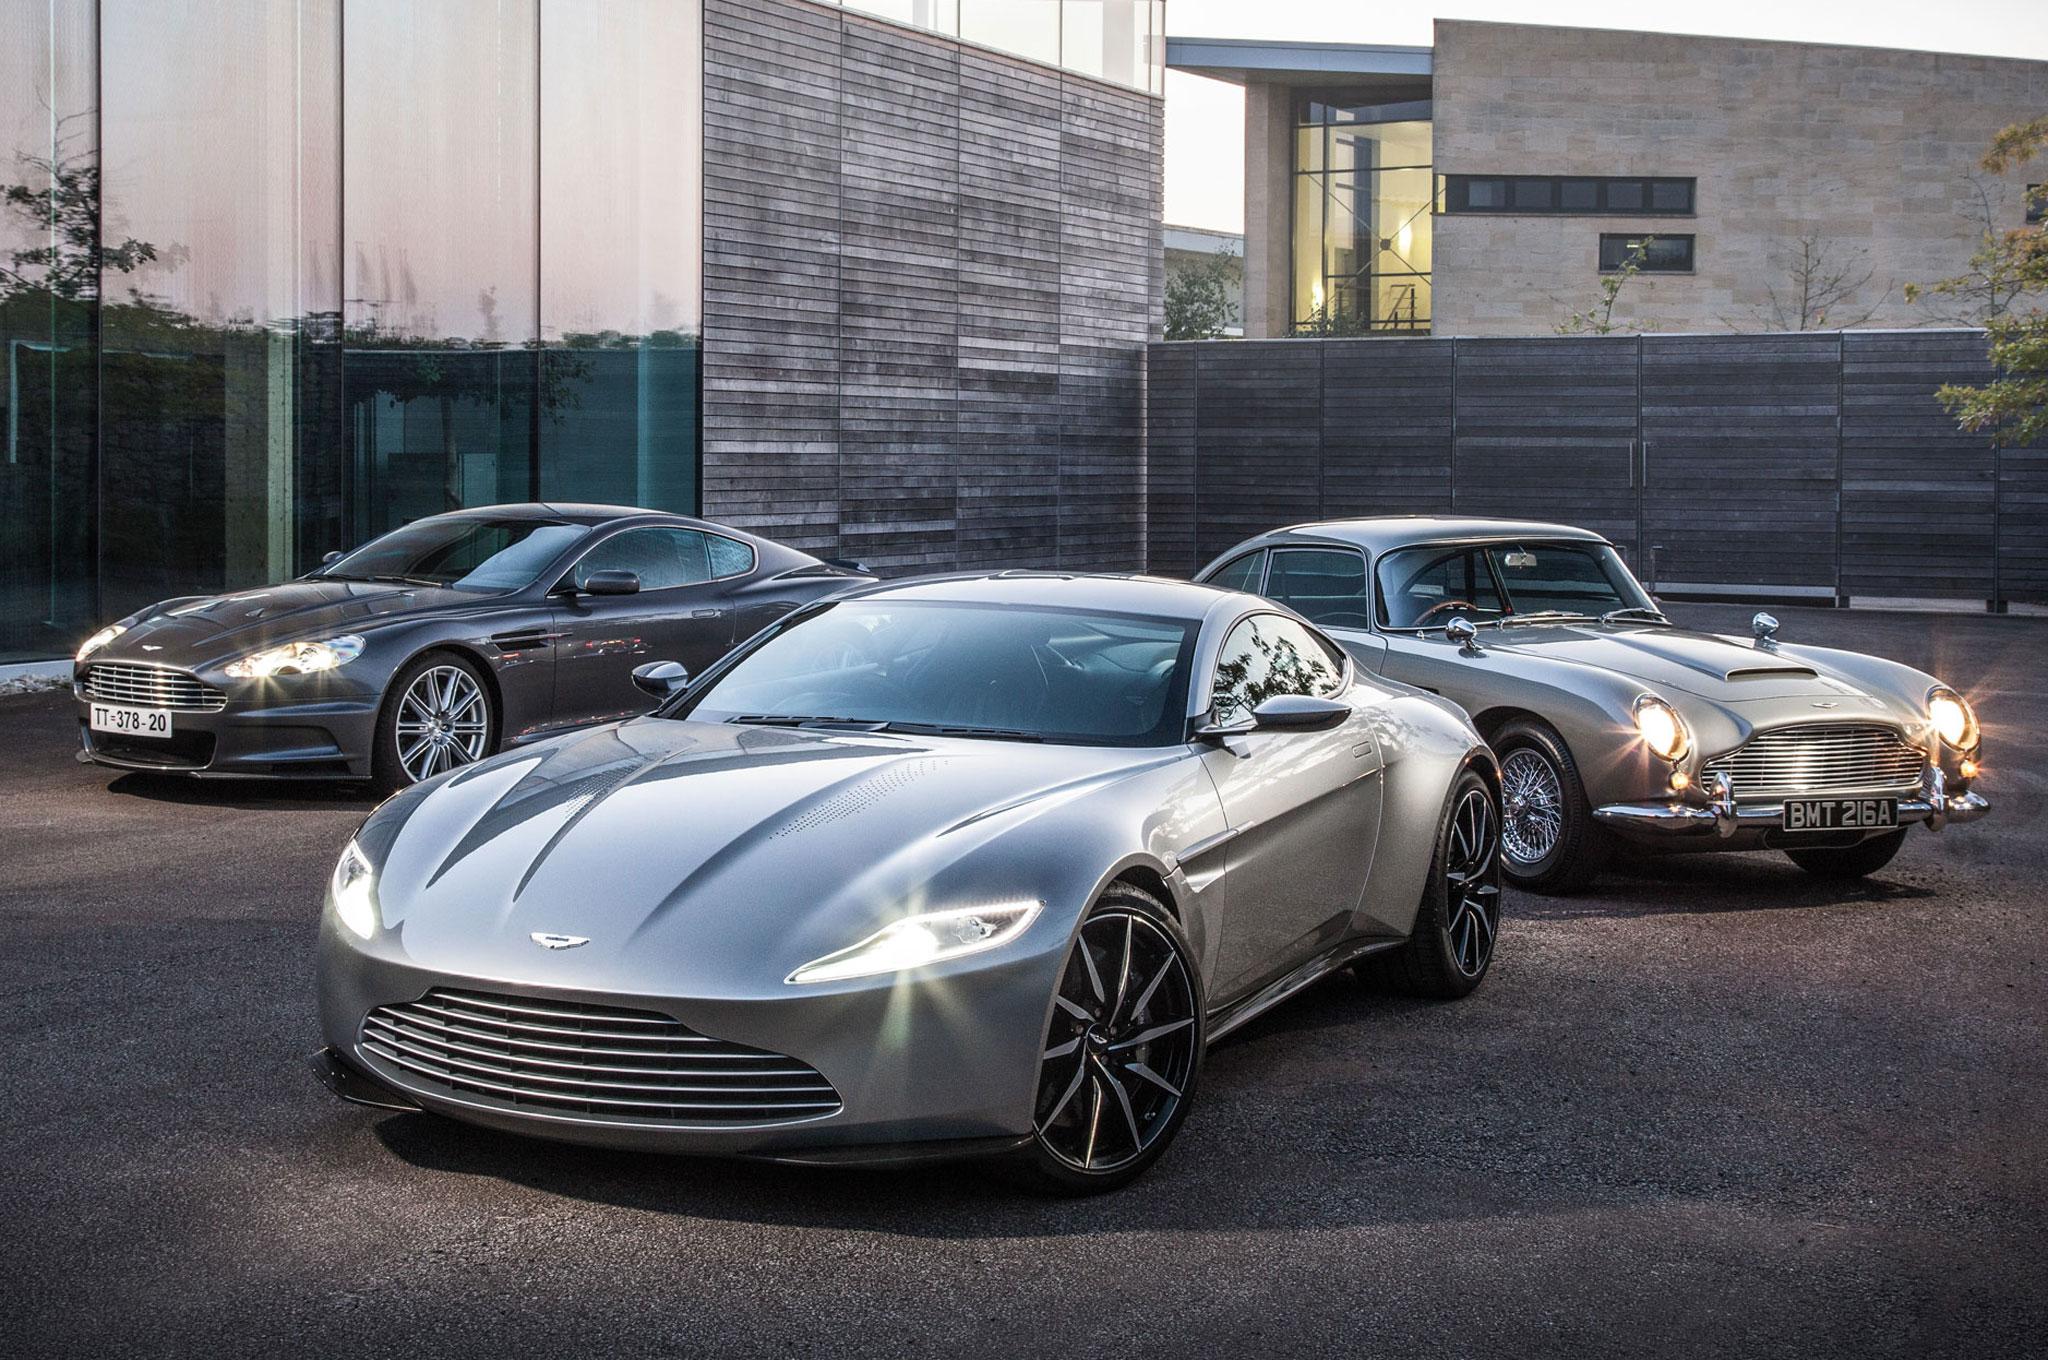 Bulletproof Driving James Bonds Aston Martin DB DBS And DB - Aston martin db 10